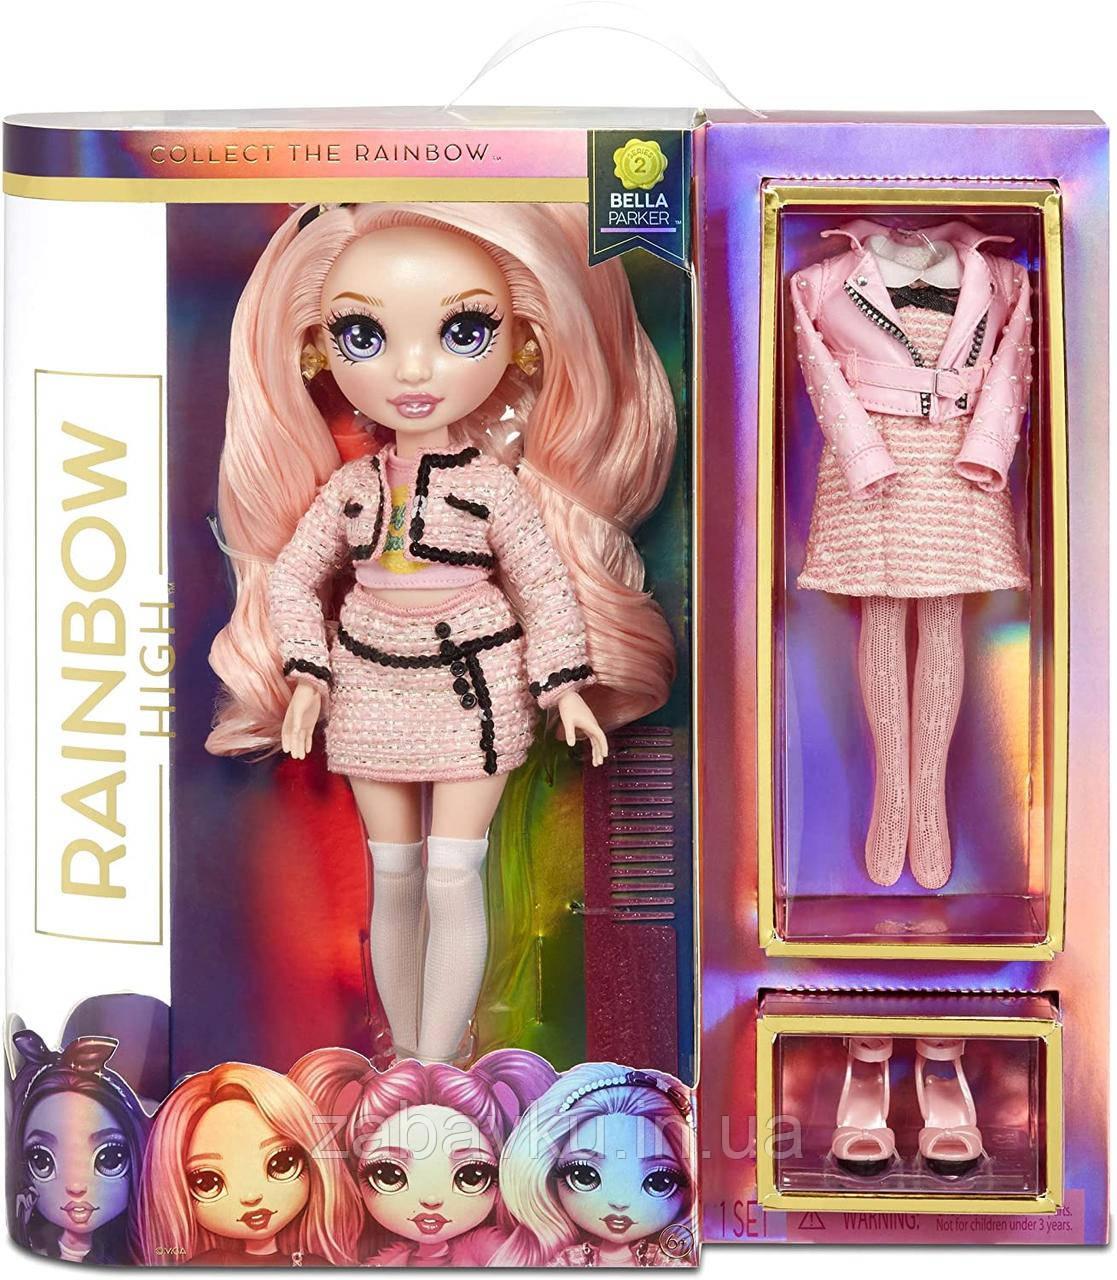 Rainbow High Bella Parke Кукла Рейнбоу Хай Белла Паркер MGA